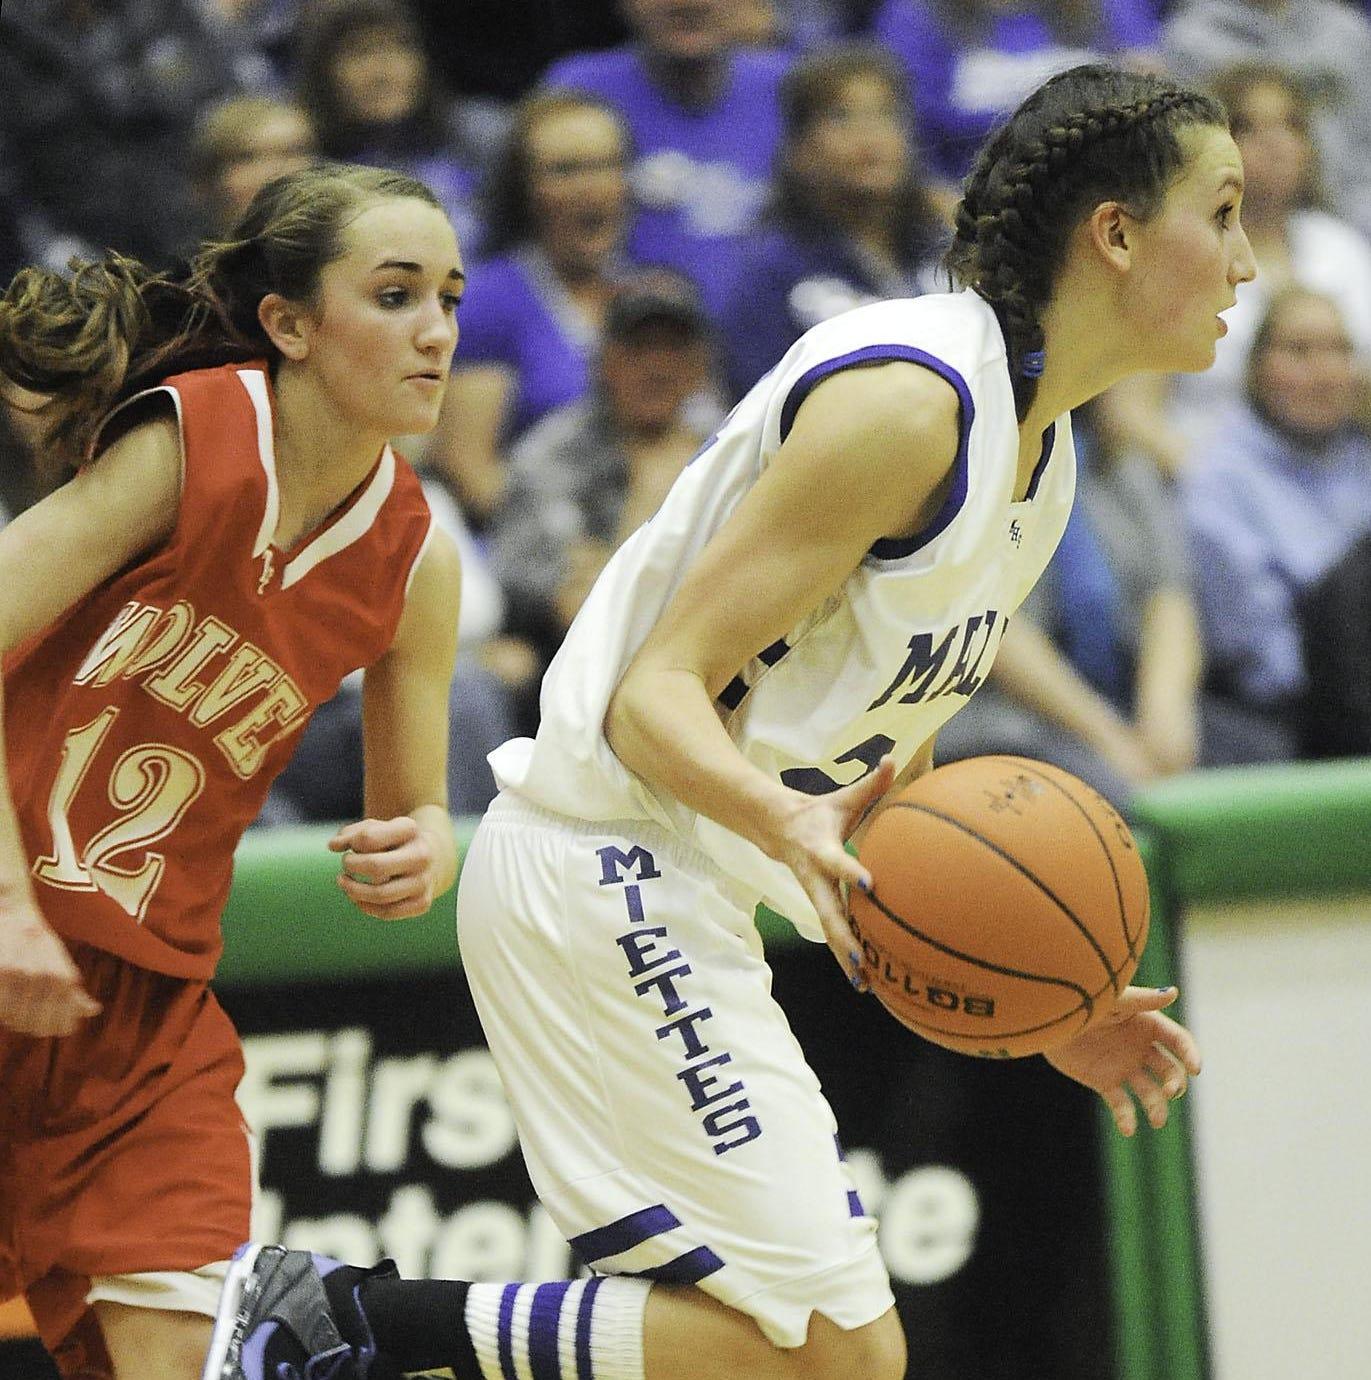 GOAT girls' basketball: Malta M-Ettes have always set the standard